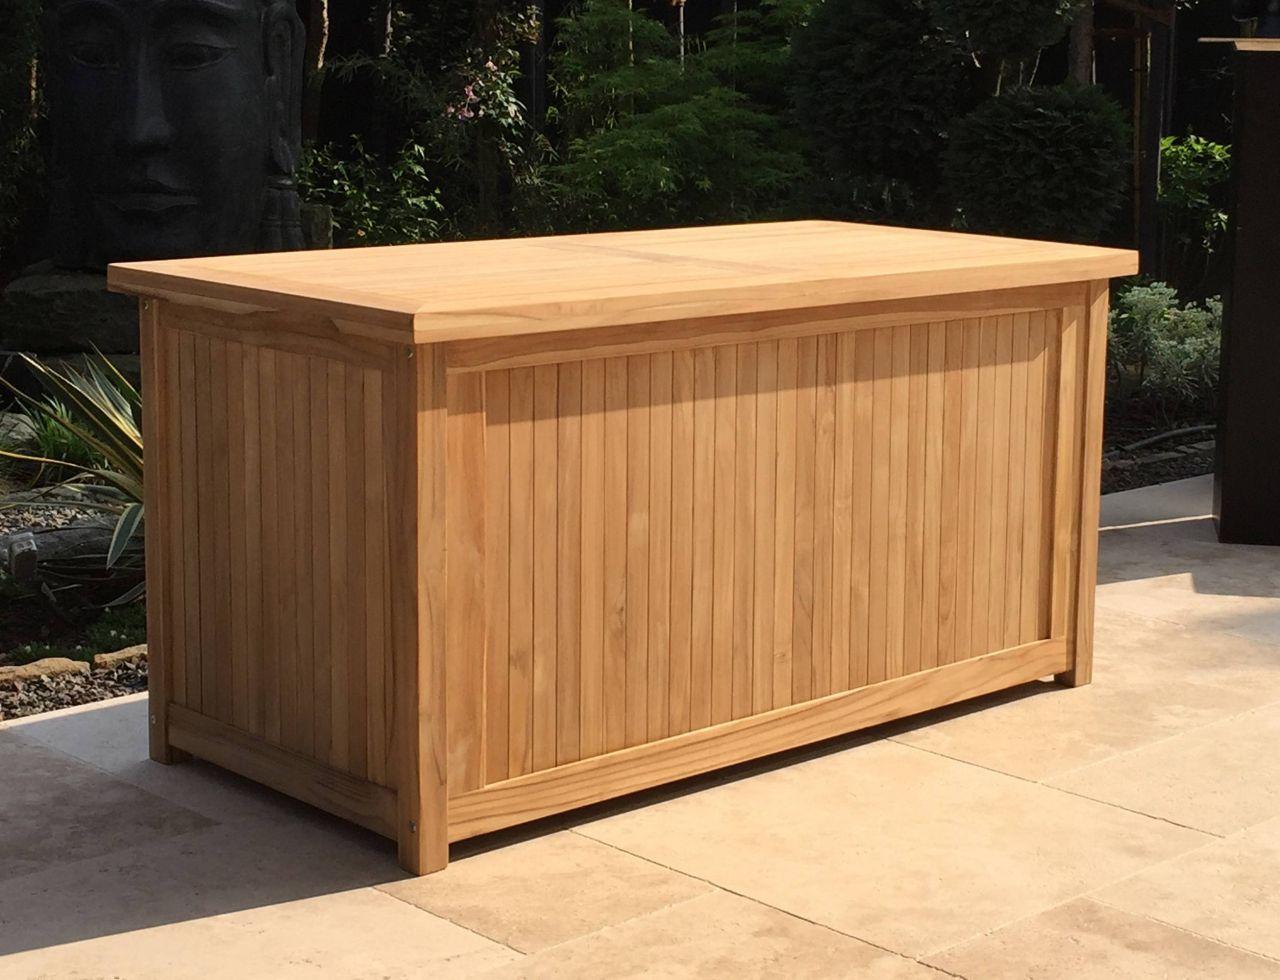 grasekamp kissenbox auflagenbox gartenbox truhe legacy teak jetzt bestellen unter https. Black Bedroom Furniture Sets. Home Design Ideas